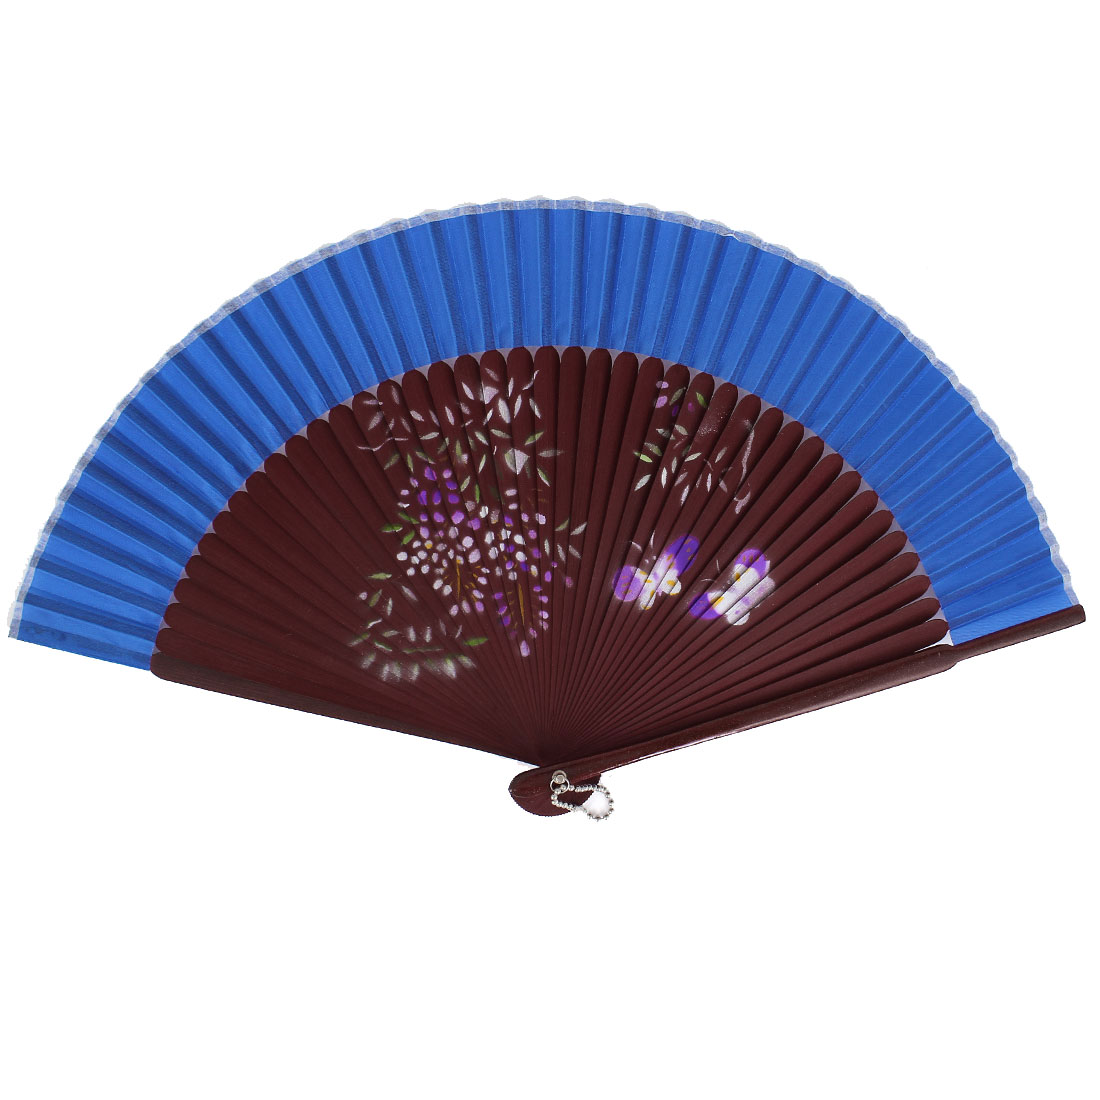 Chinese Style Blooming Flower Print Wood Handheld Folding Hand Fan Blue Burgundy